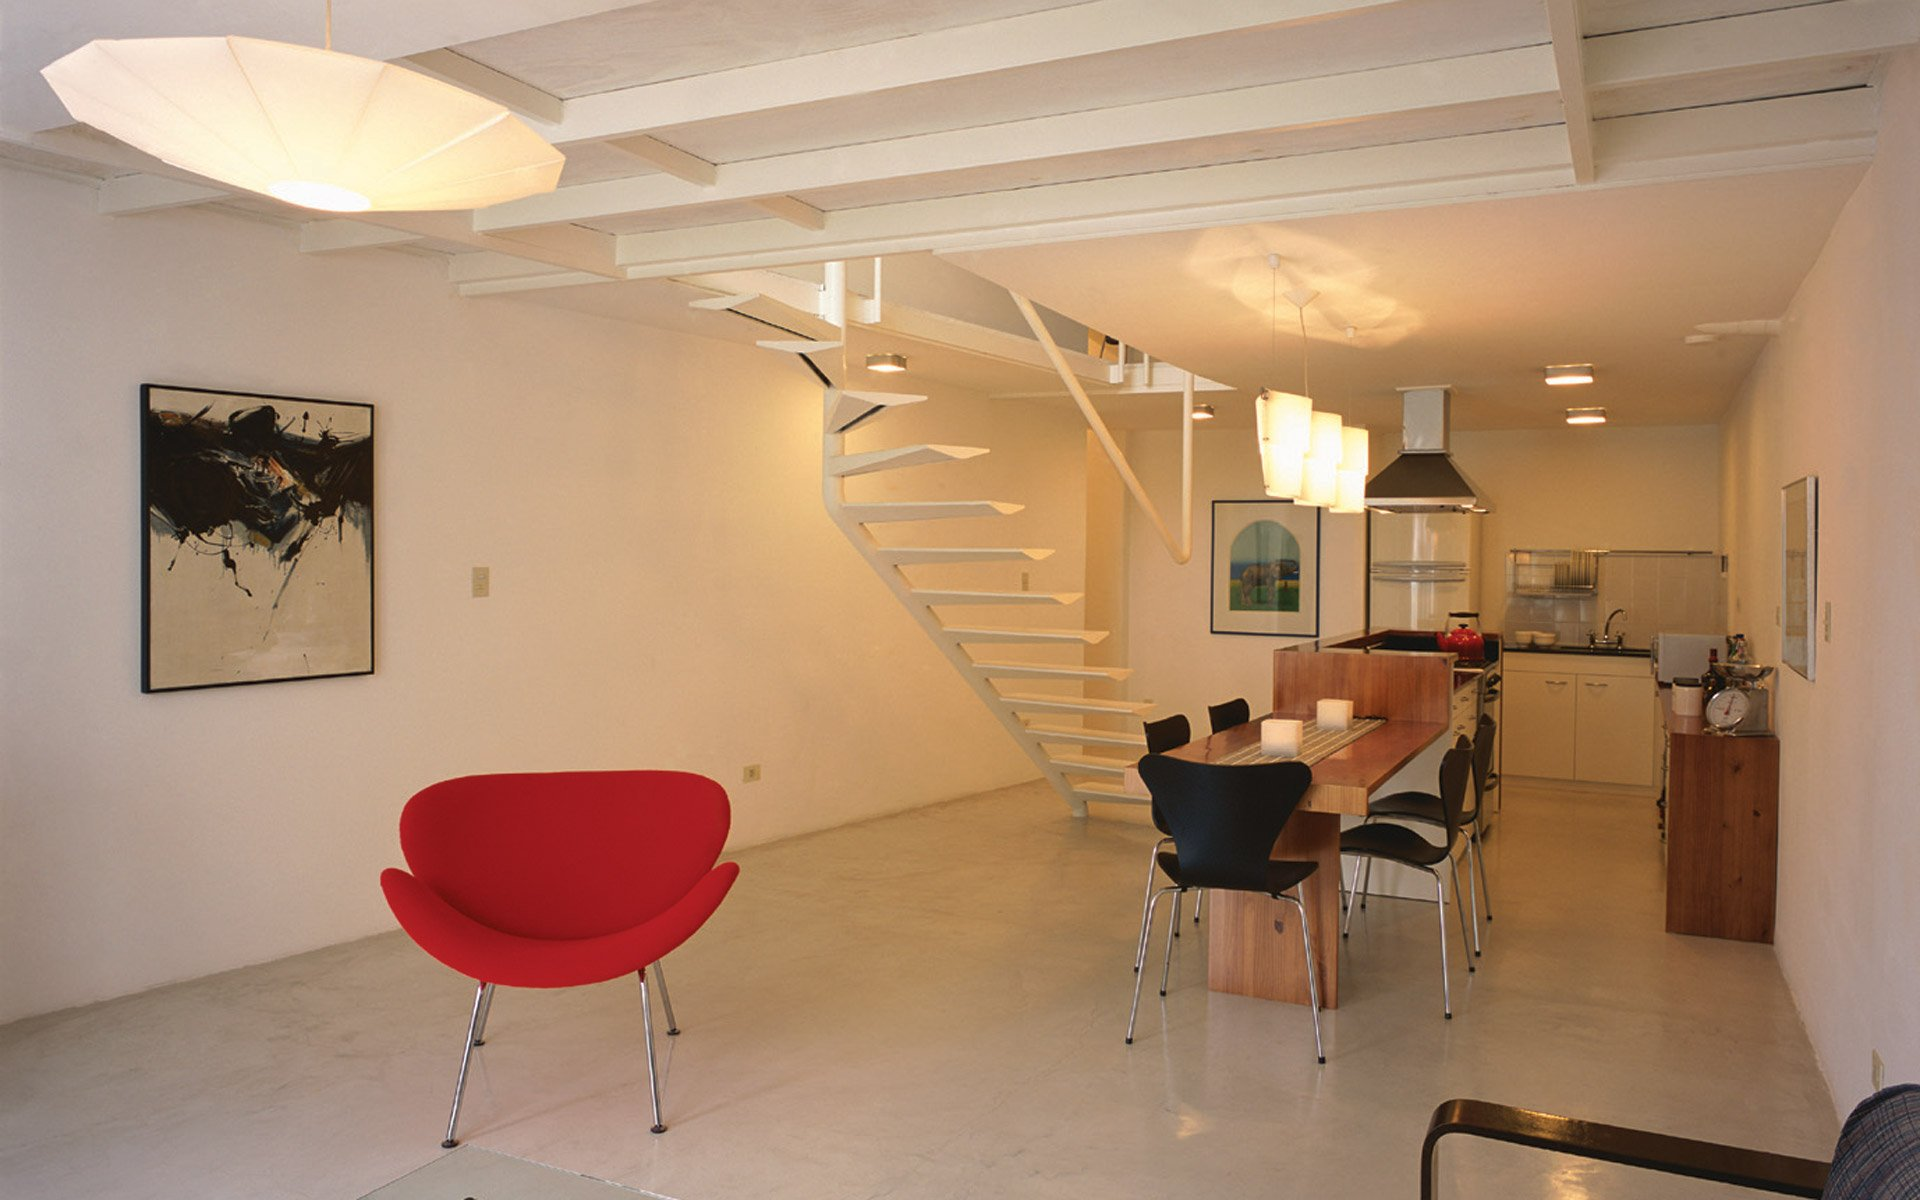 Estudio de arquitectura y dise o noa najmias oficina de for Estudio de arquitectura y diseno